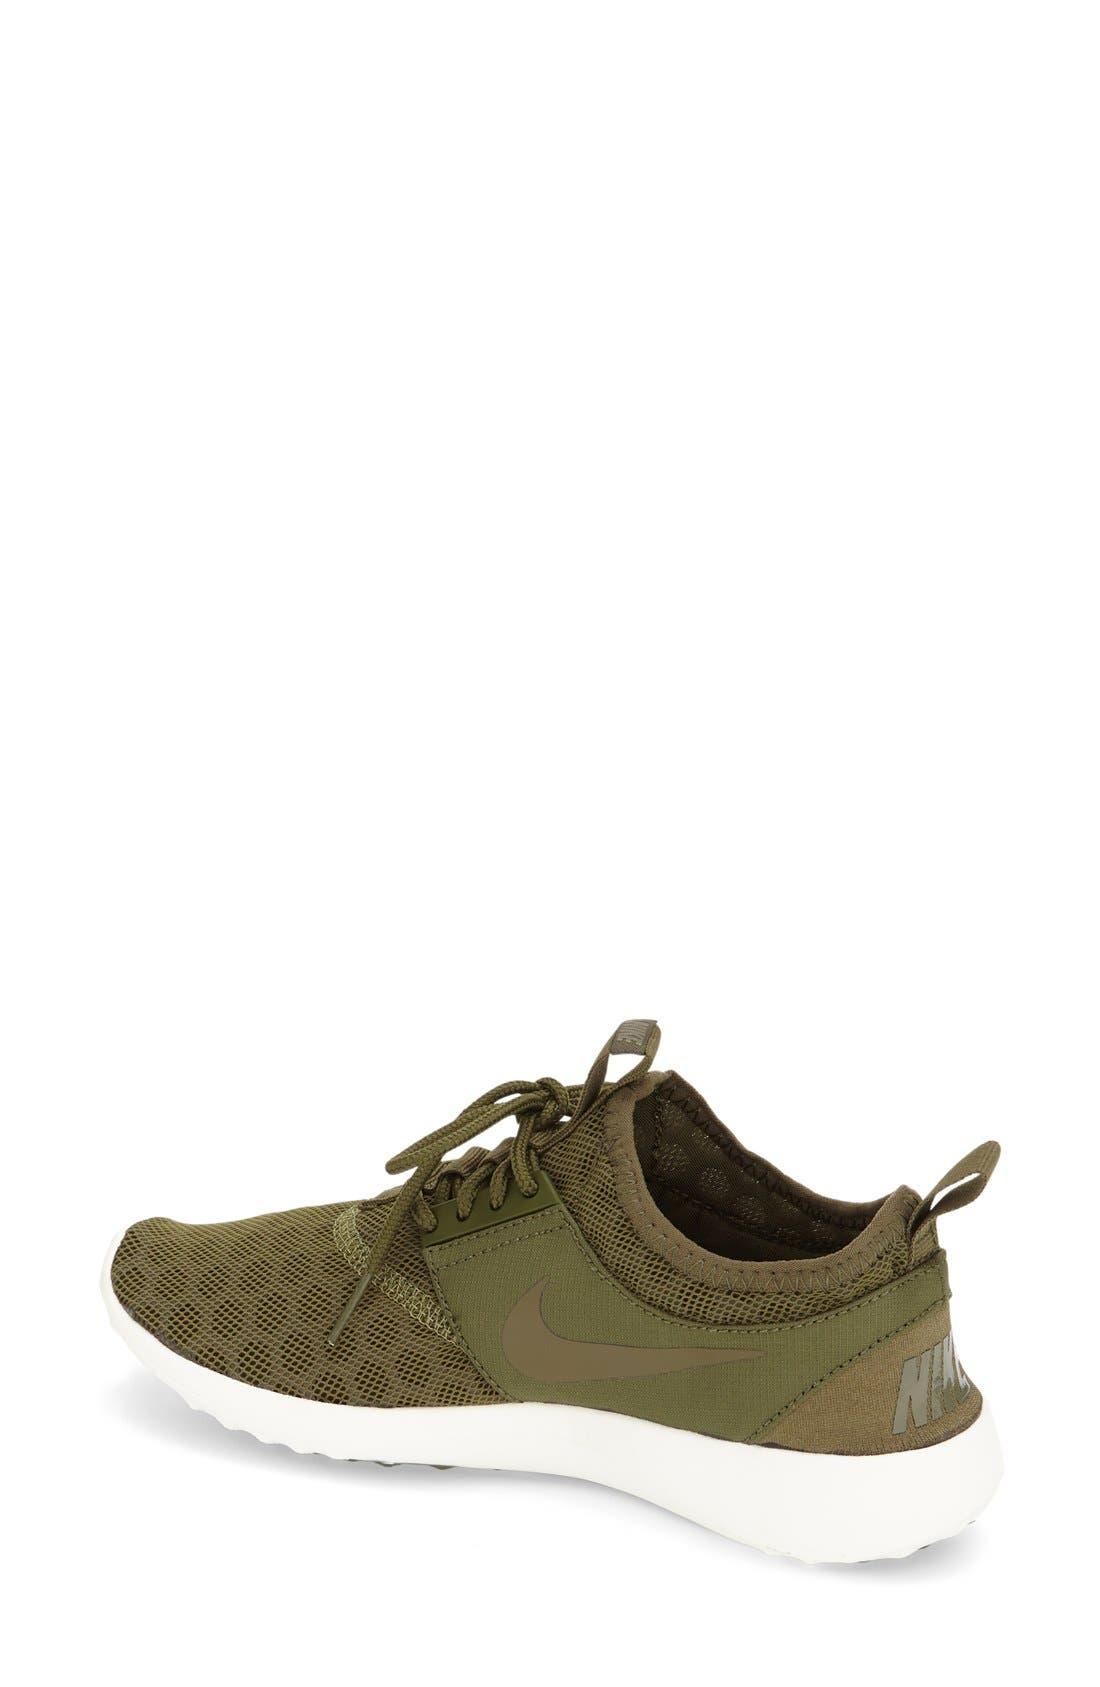 ,                             'Juvenate' Sneaker,                             Alternate thumbnail 137, color,                             300